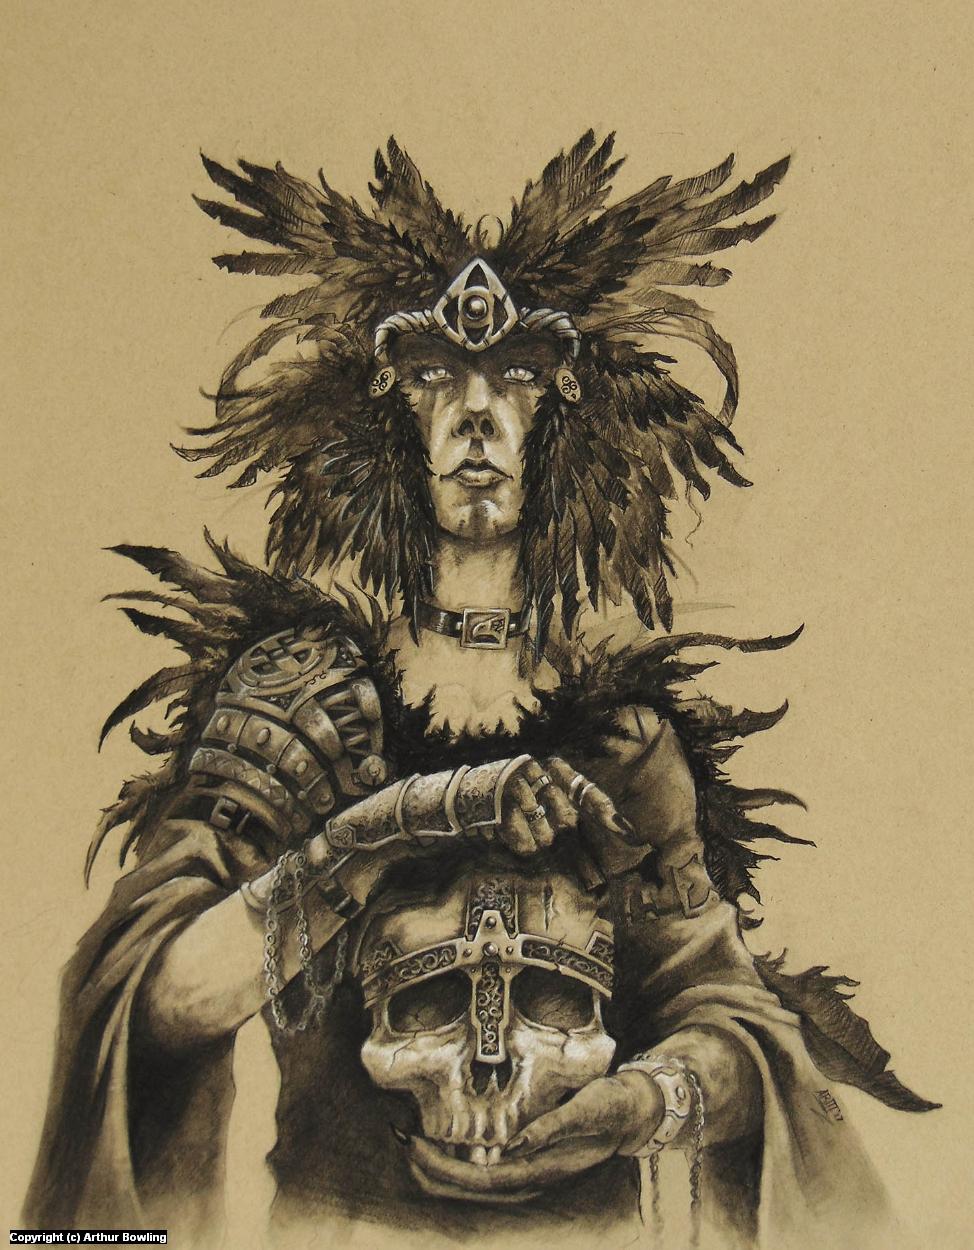 The Morrigan Artwork by Arthur Bowling